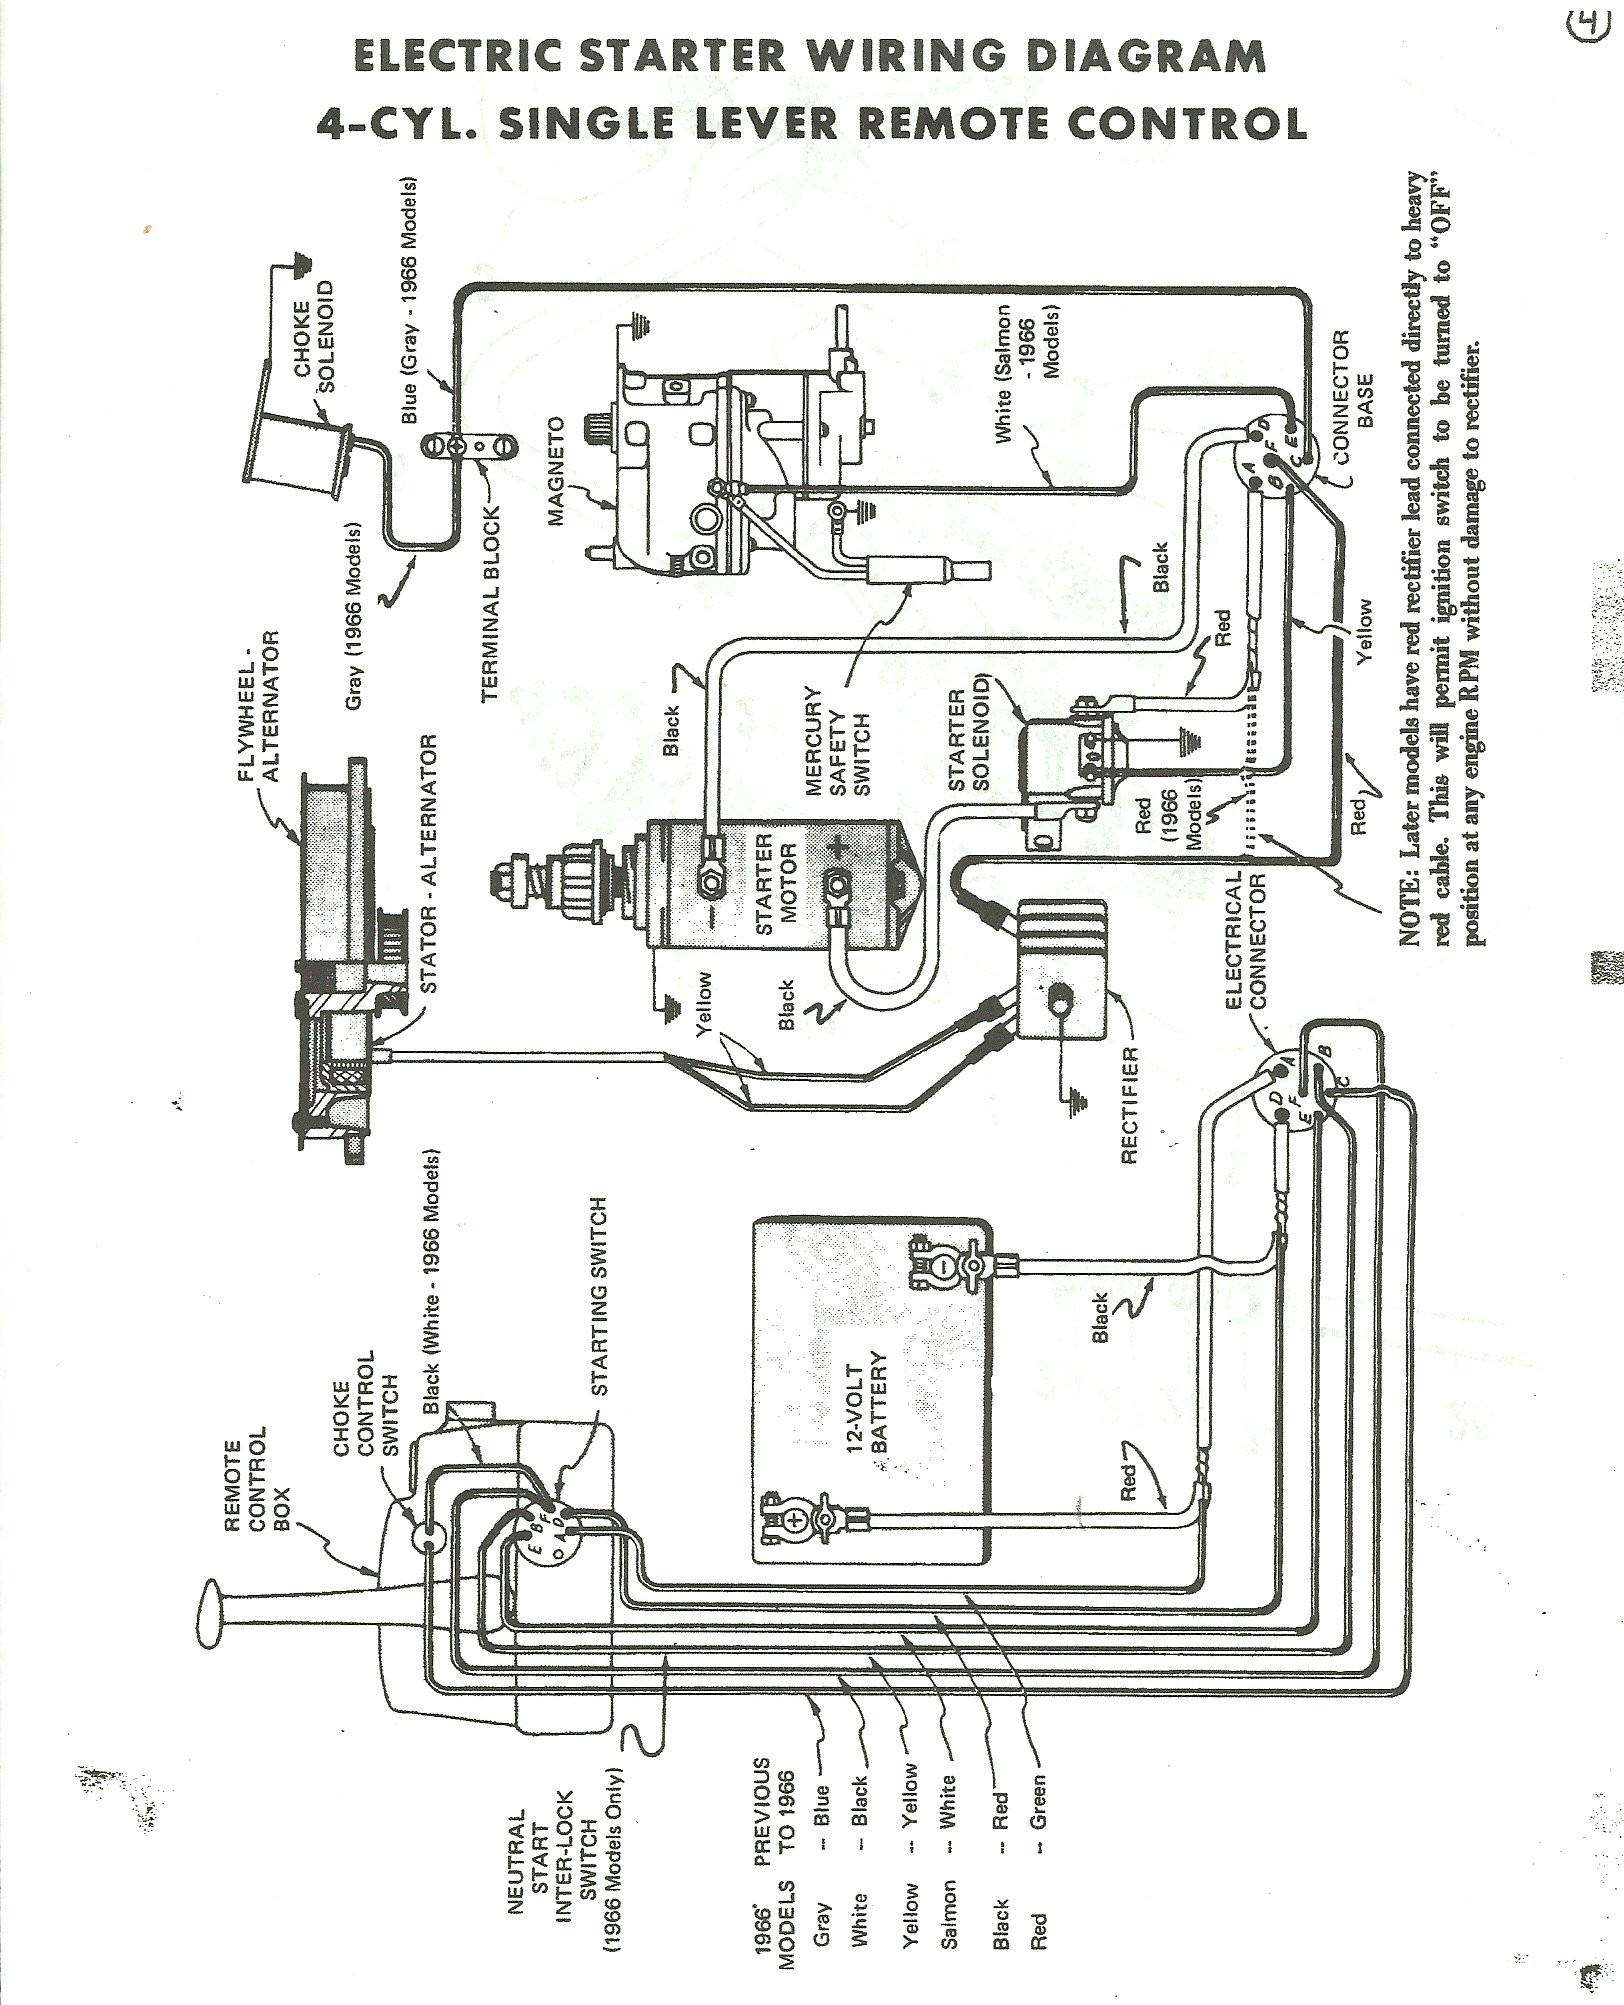 mercury 500 outboard engine parts diagram house wiring diagram rh maxturner co